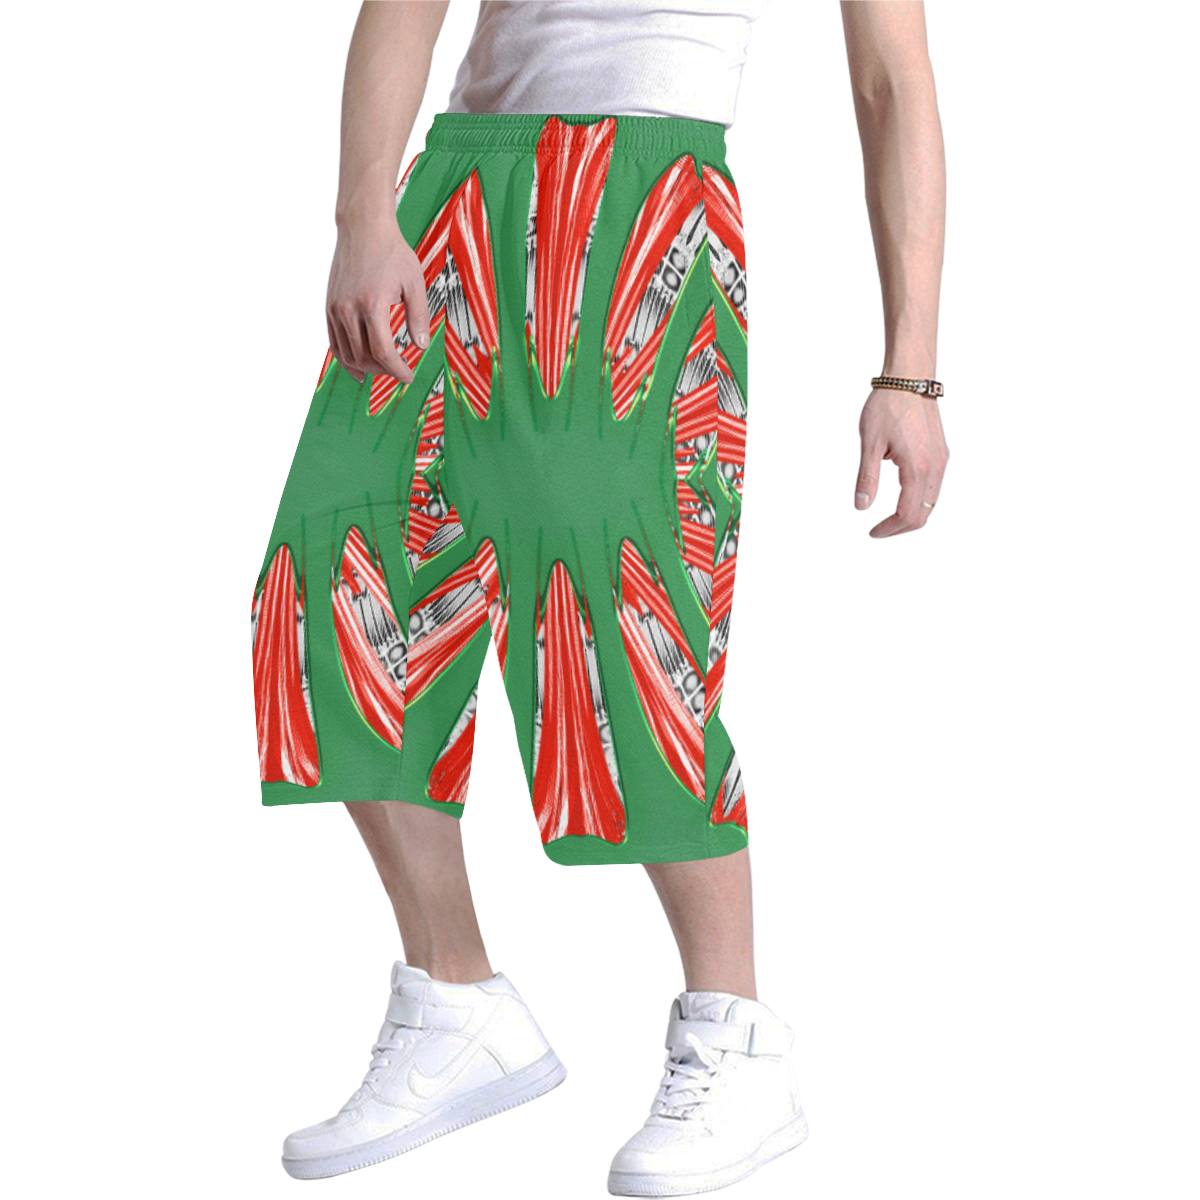 8000  EKPAH 9 Men's All Over Print Baggy Shorts (Model L37)